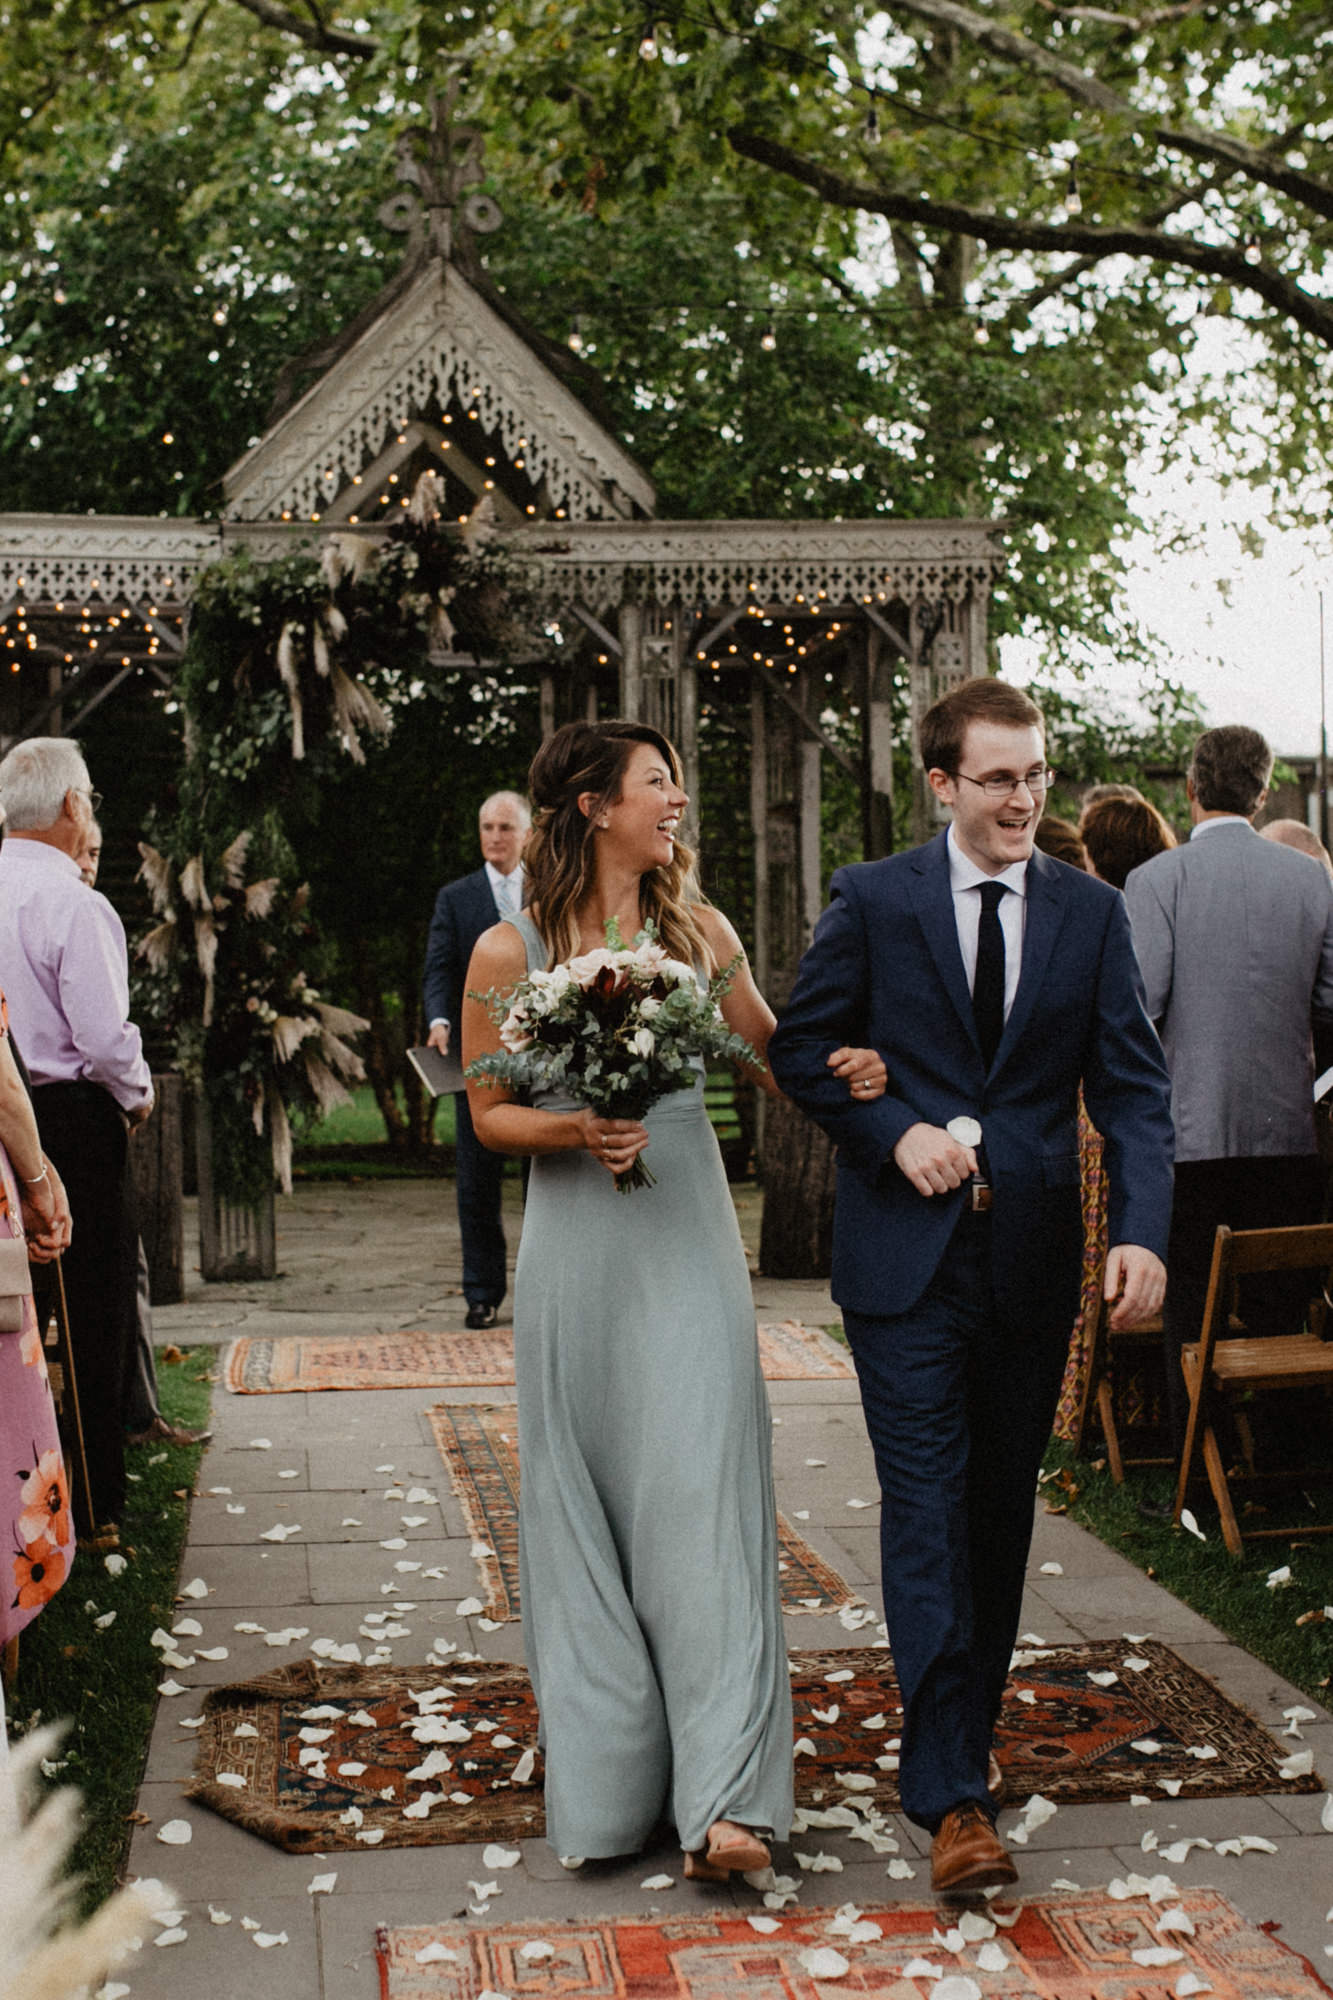 terrain-events-wedding-photographer-31.jpg